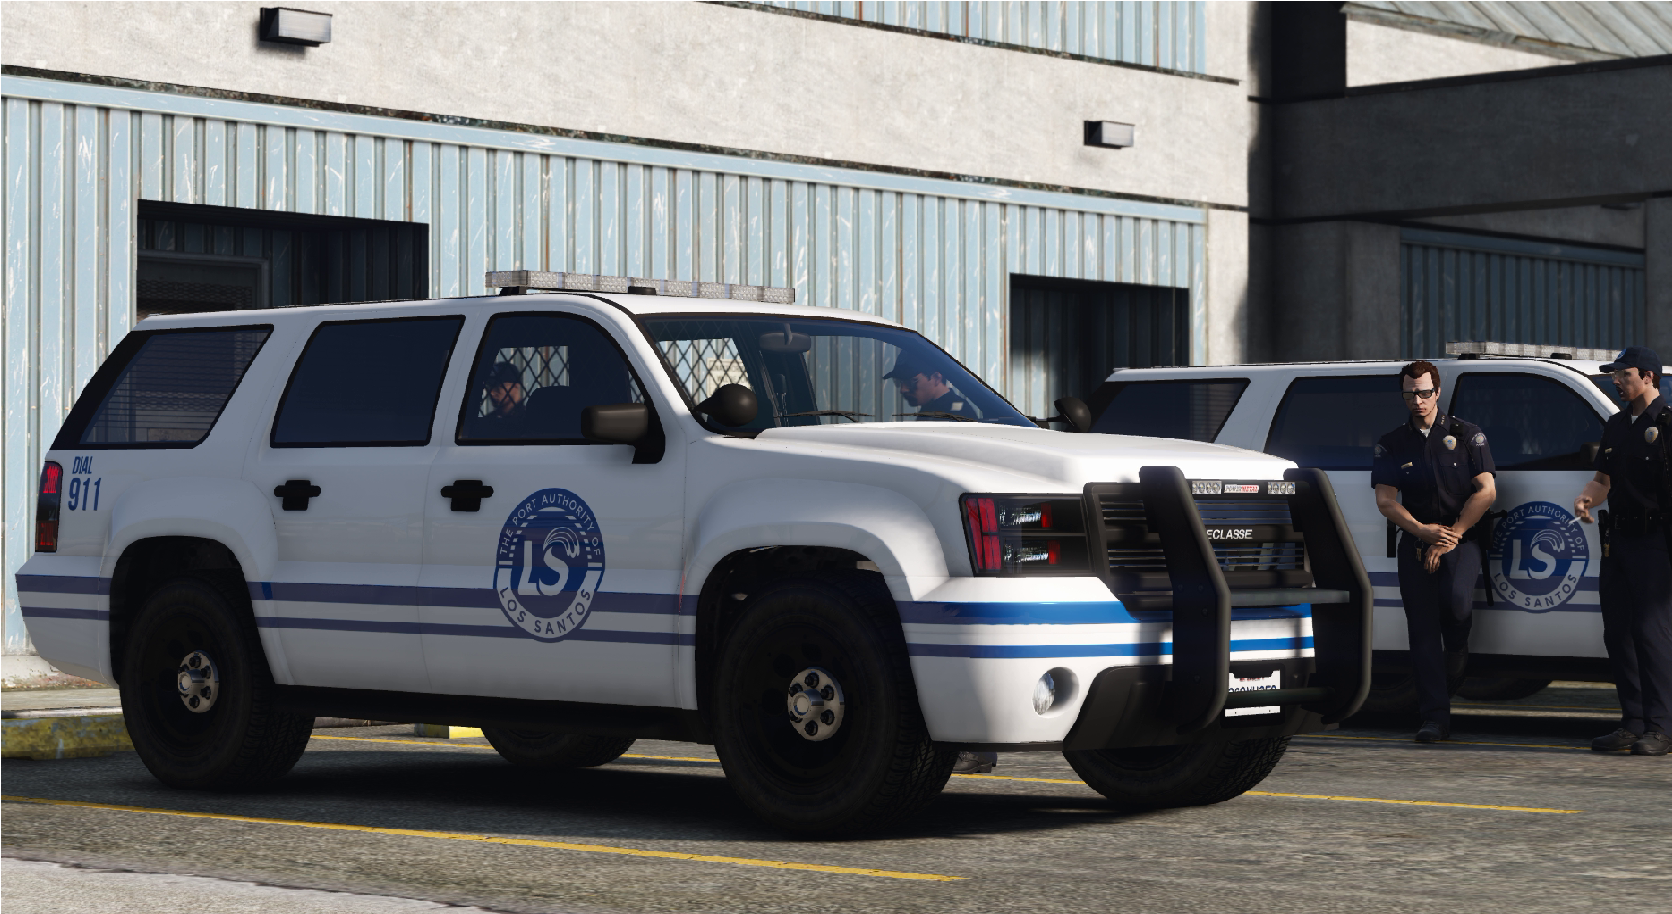 Los Santos Port Authority Alamo for IlayArye's Alamo emergency pack